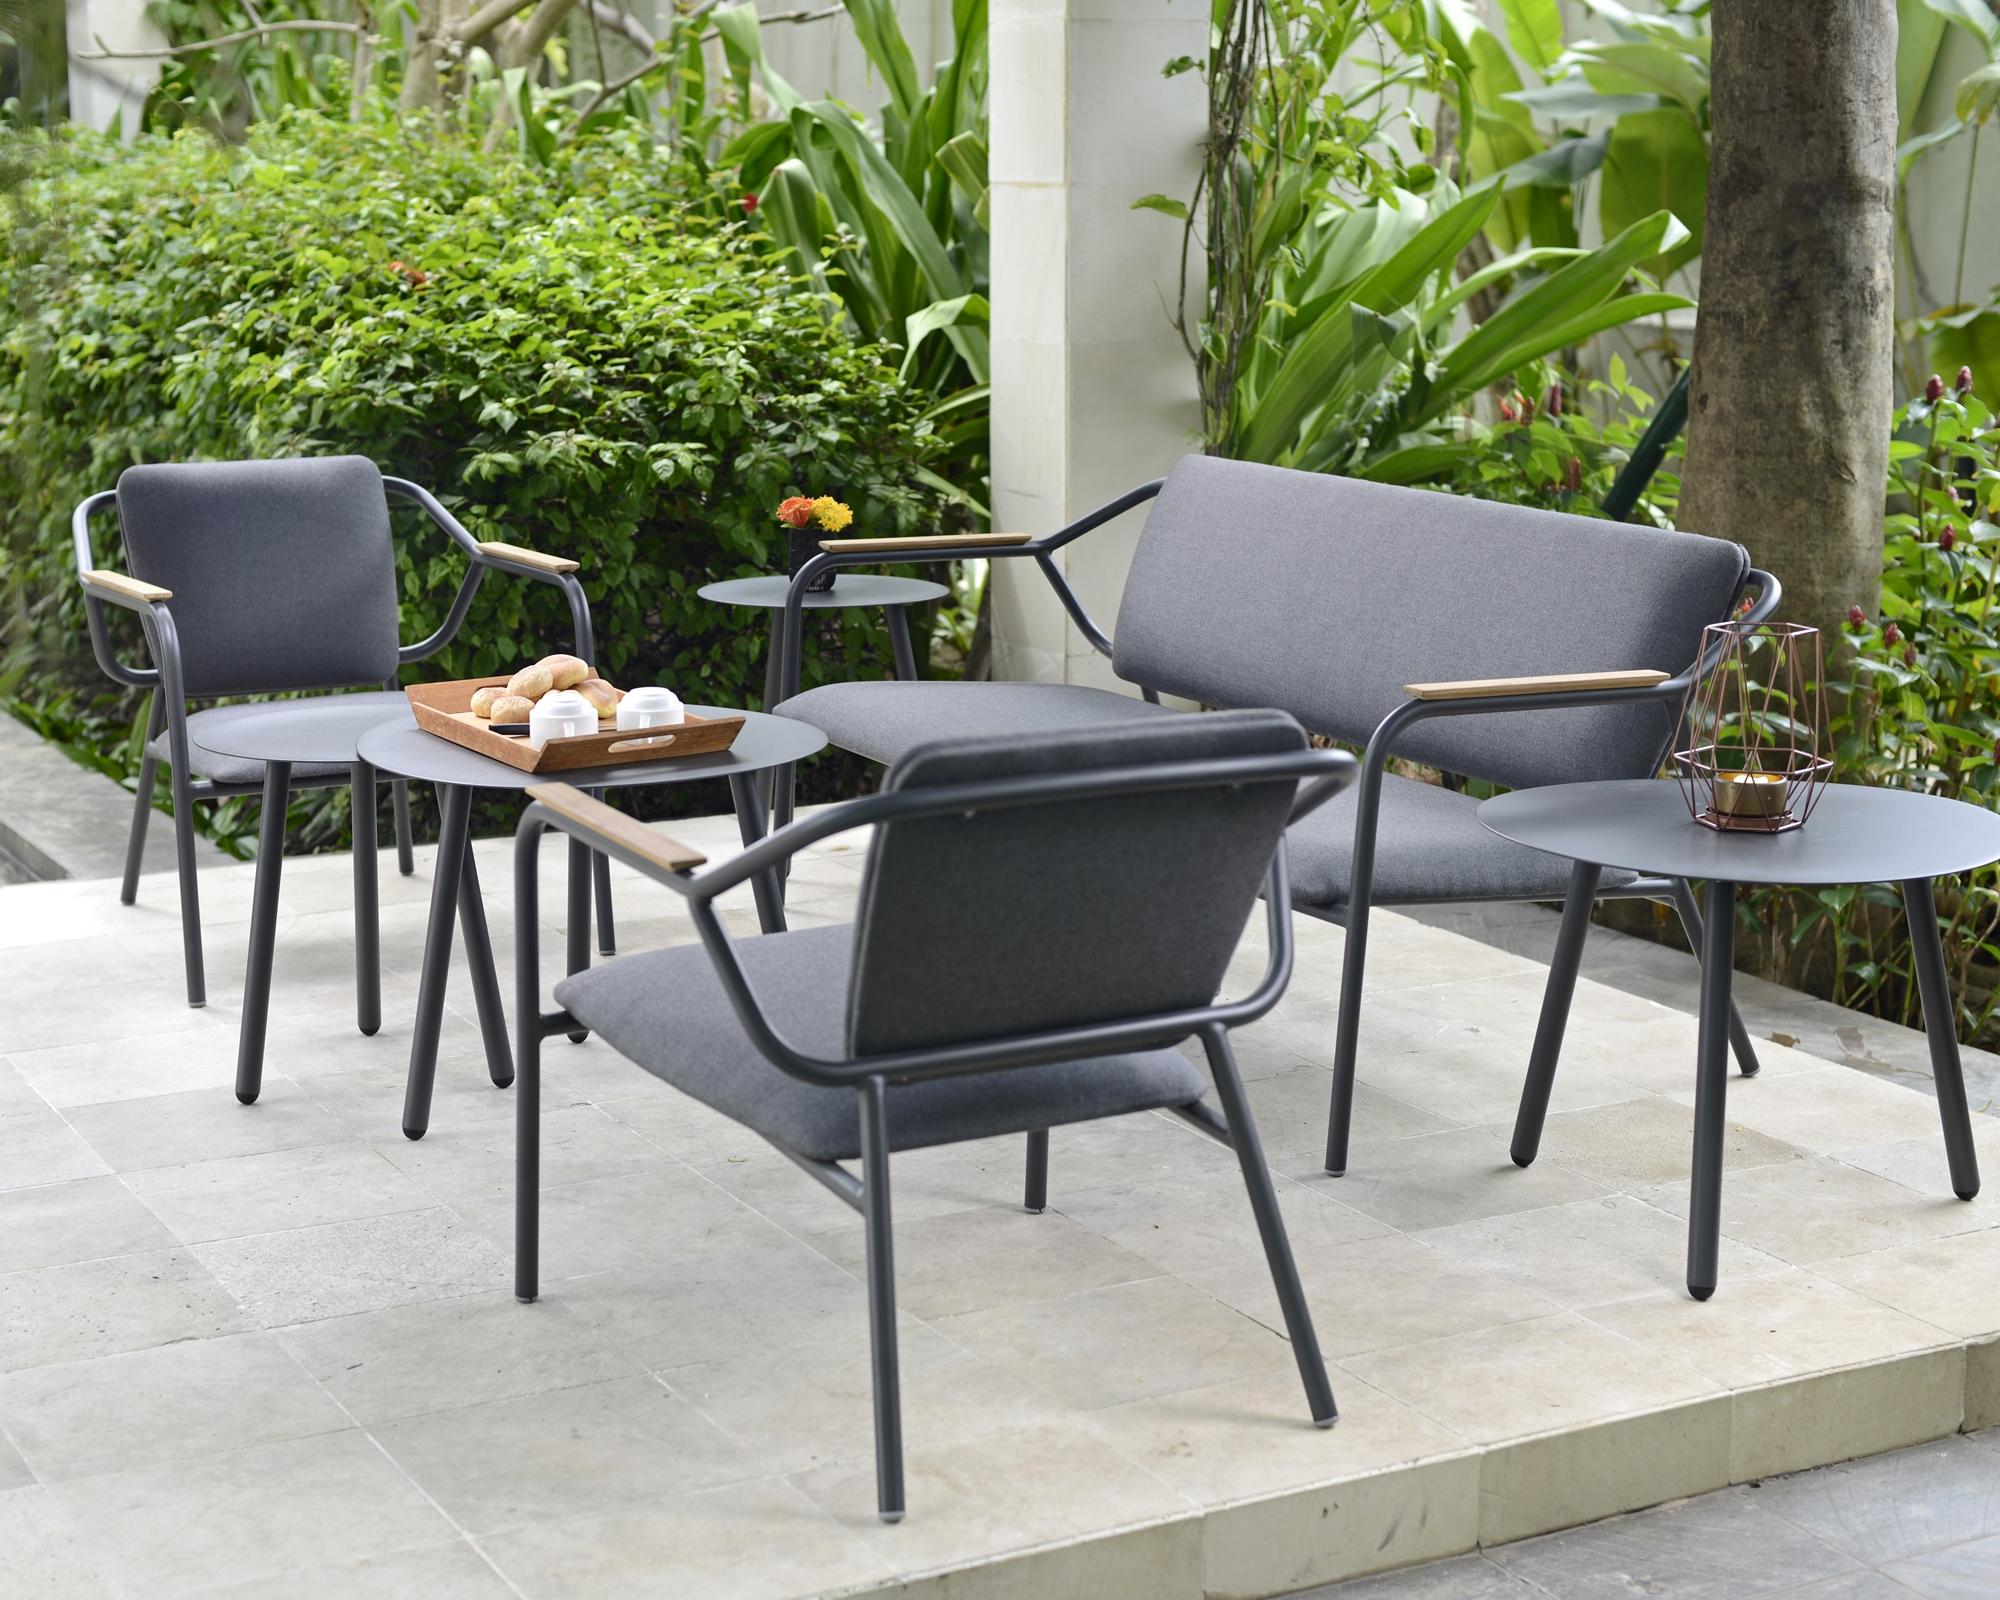 garten lounge set laka online ausstellung. Black Bedroom Furniture Sets. Home Design Ideas